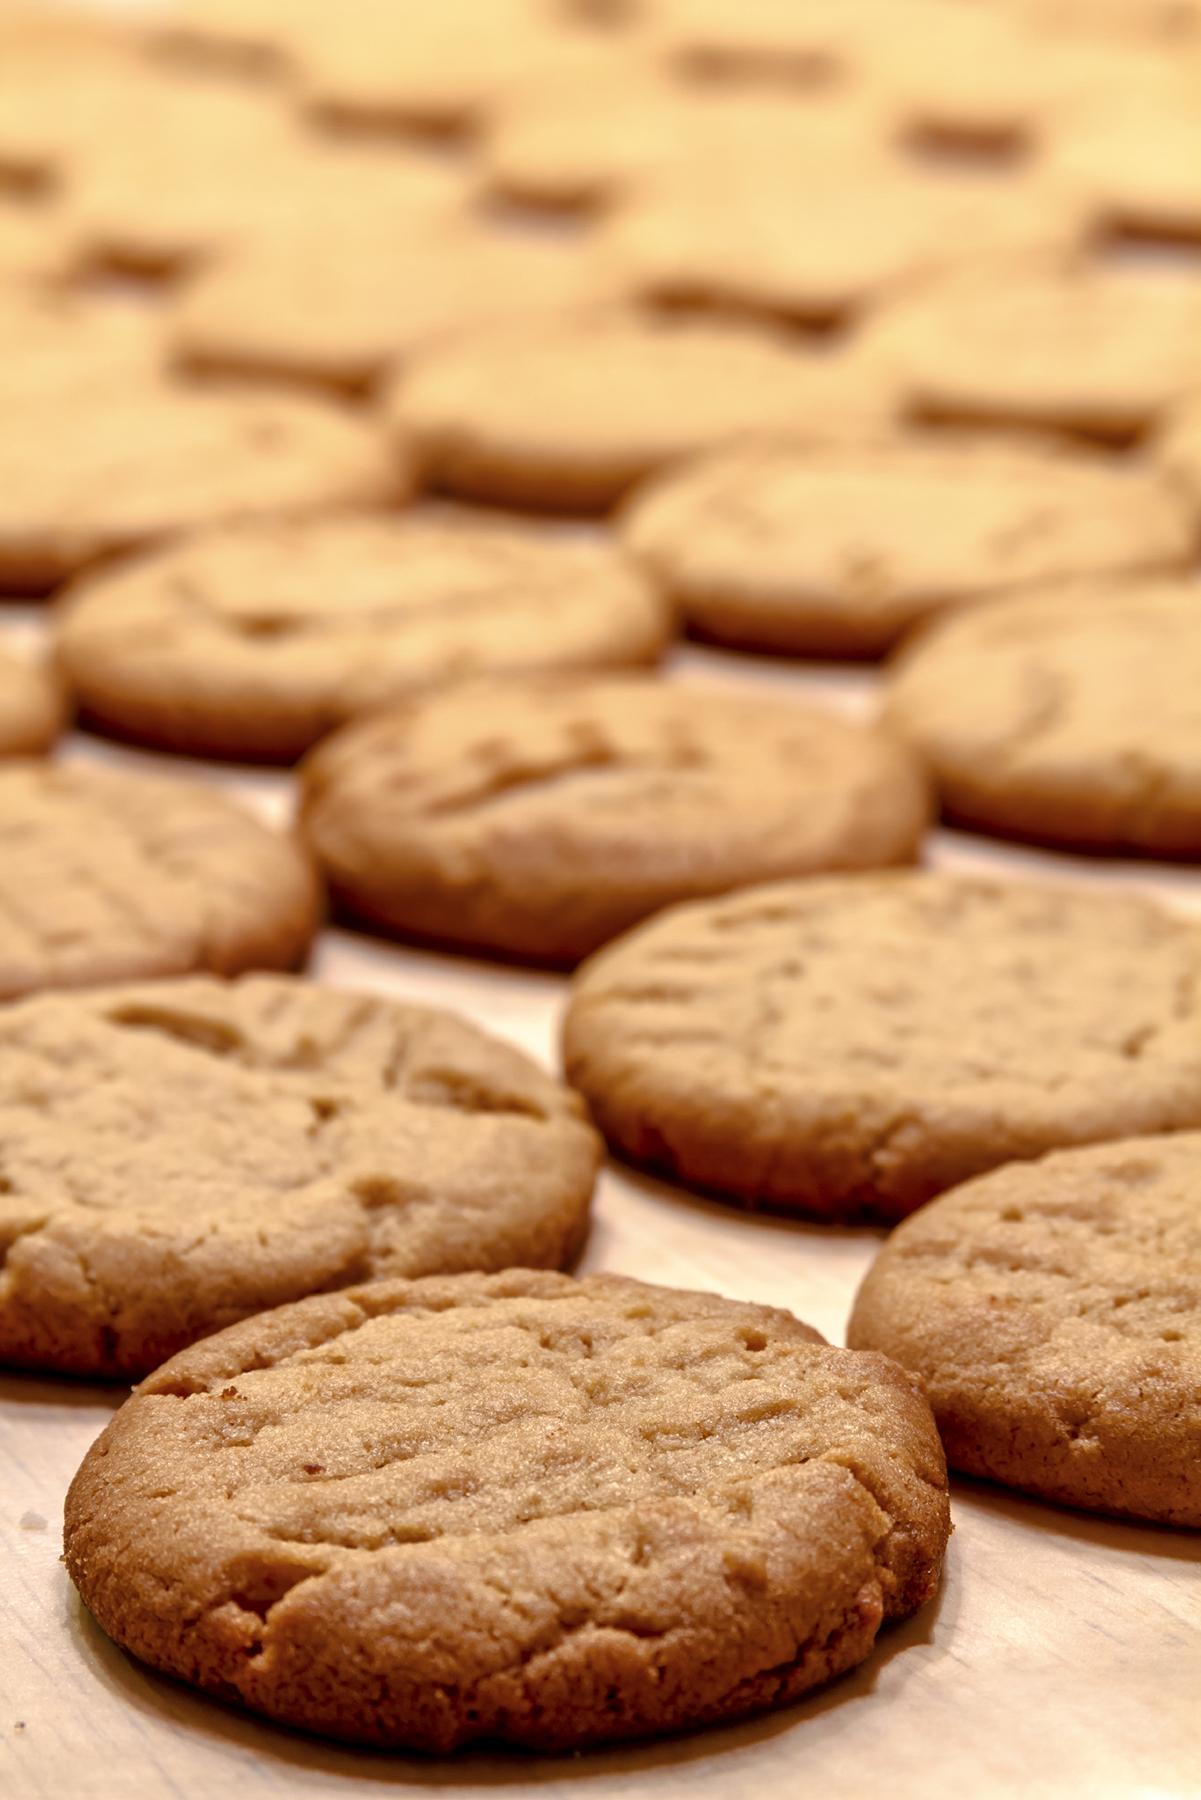 Maple Peanut Butter Cookies on BluebonnetBaker